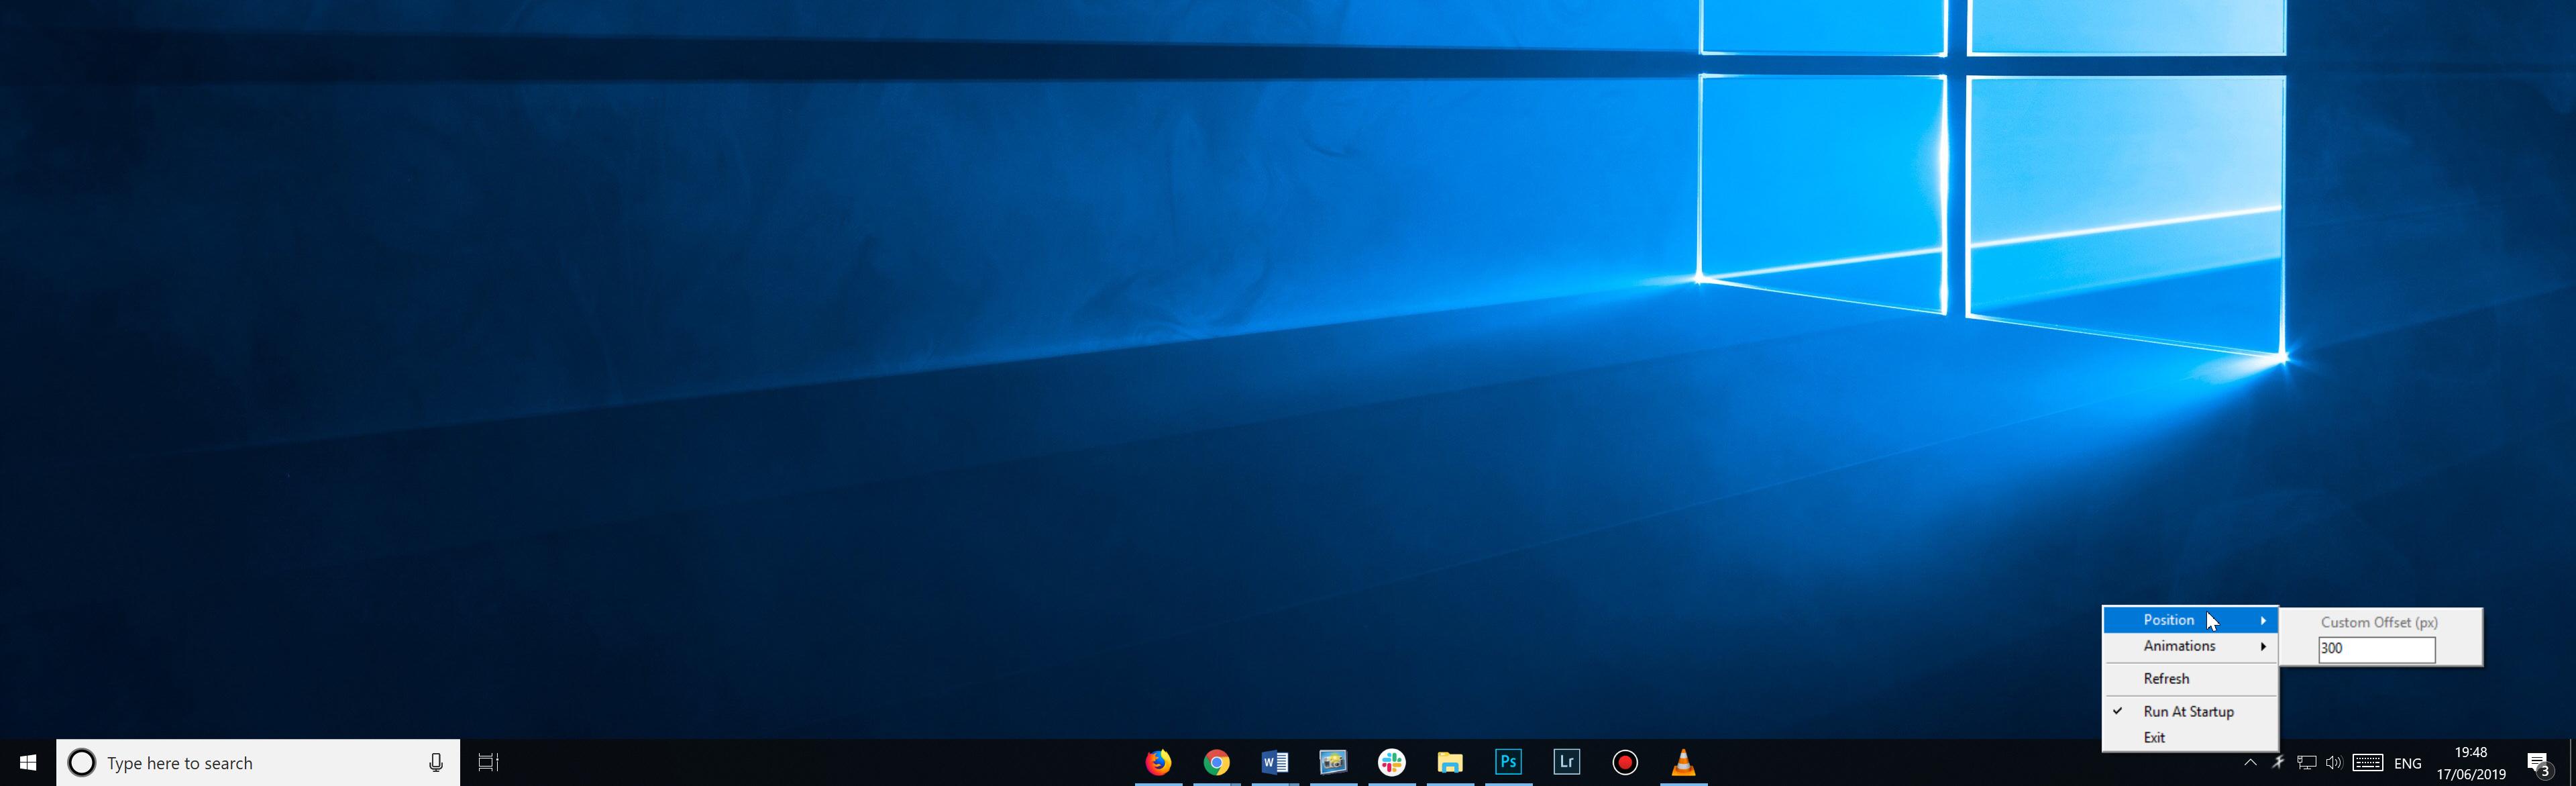 How to center Windows 10 taskbar icons | BetaNews